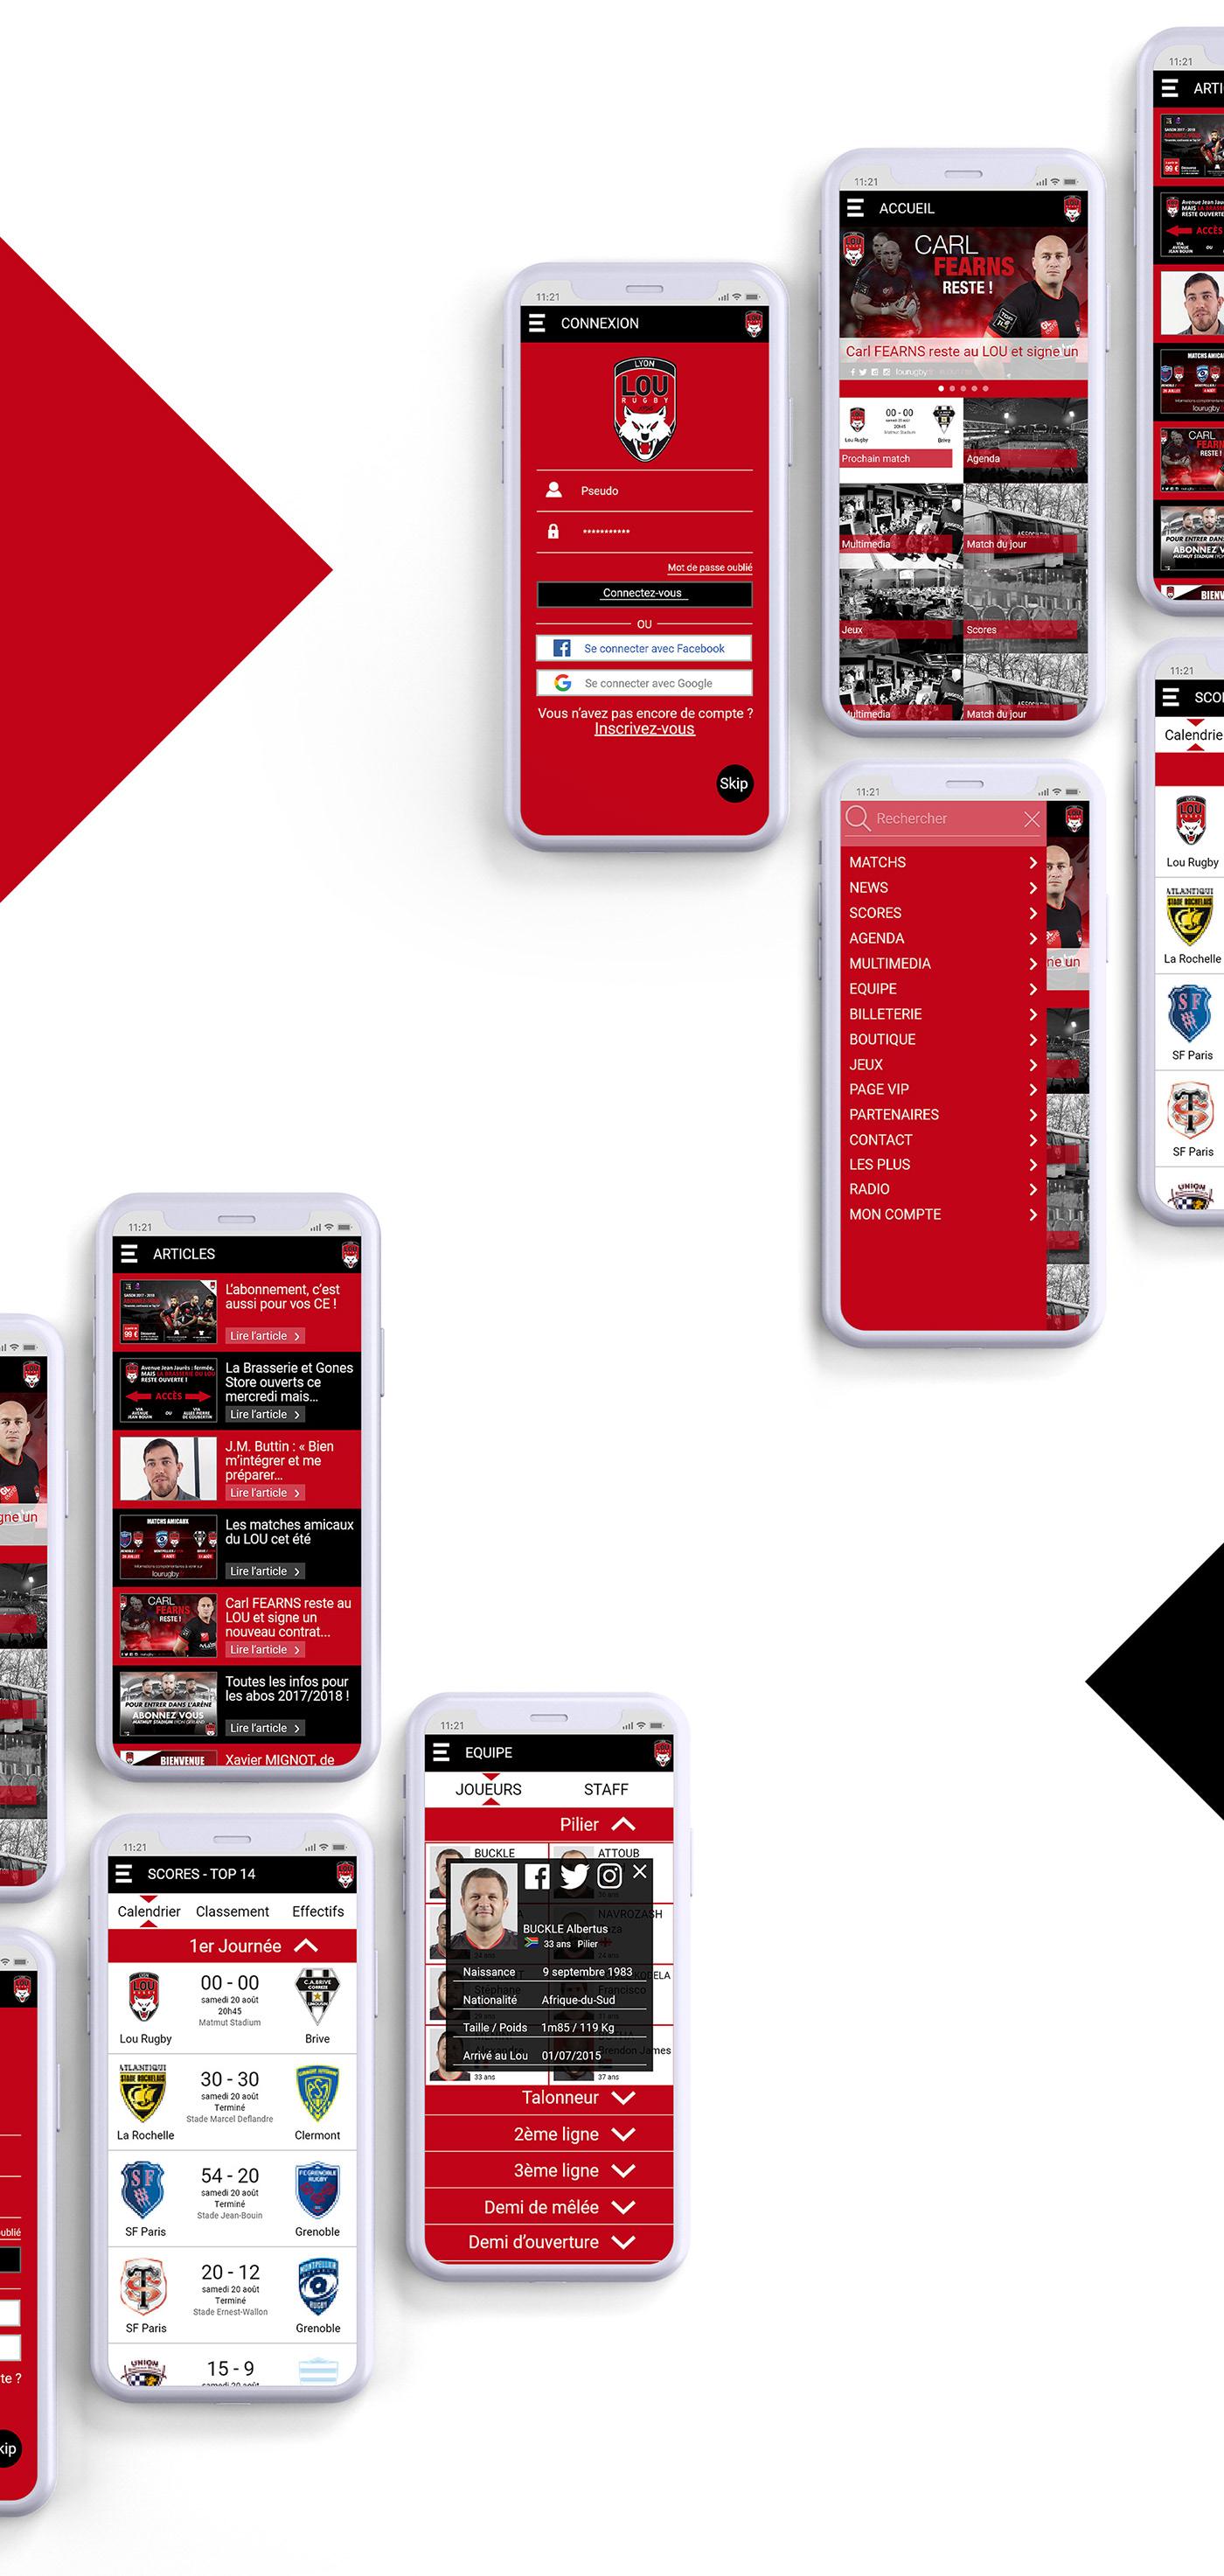 Adobe XD UX UI ux UI application Interface app Mobile app smartphone iphone